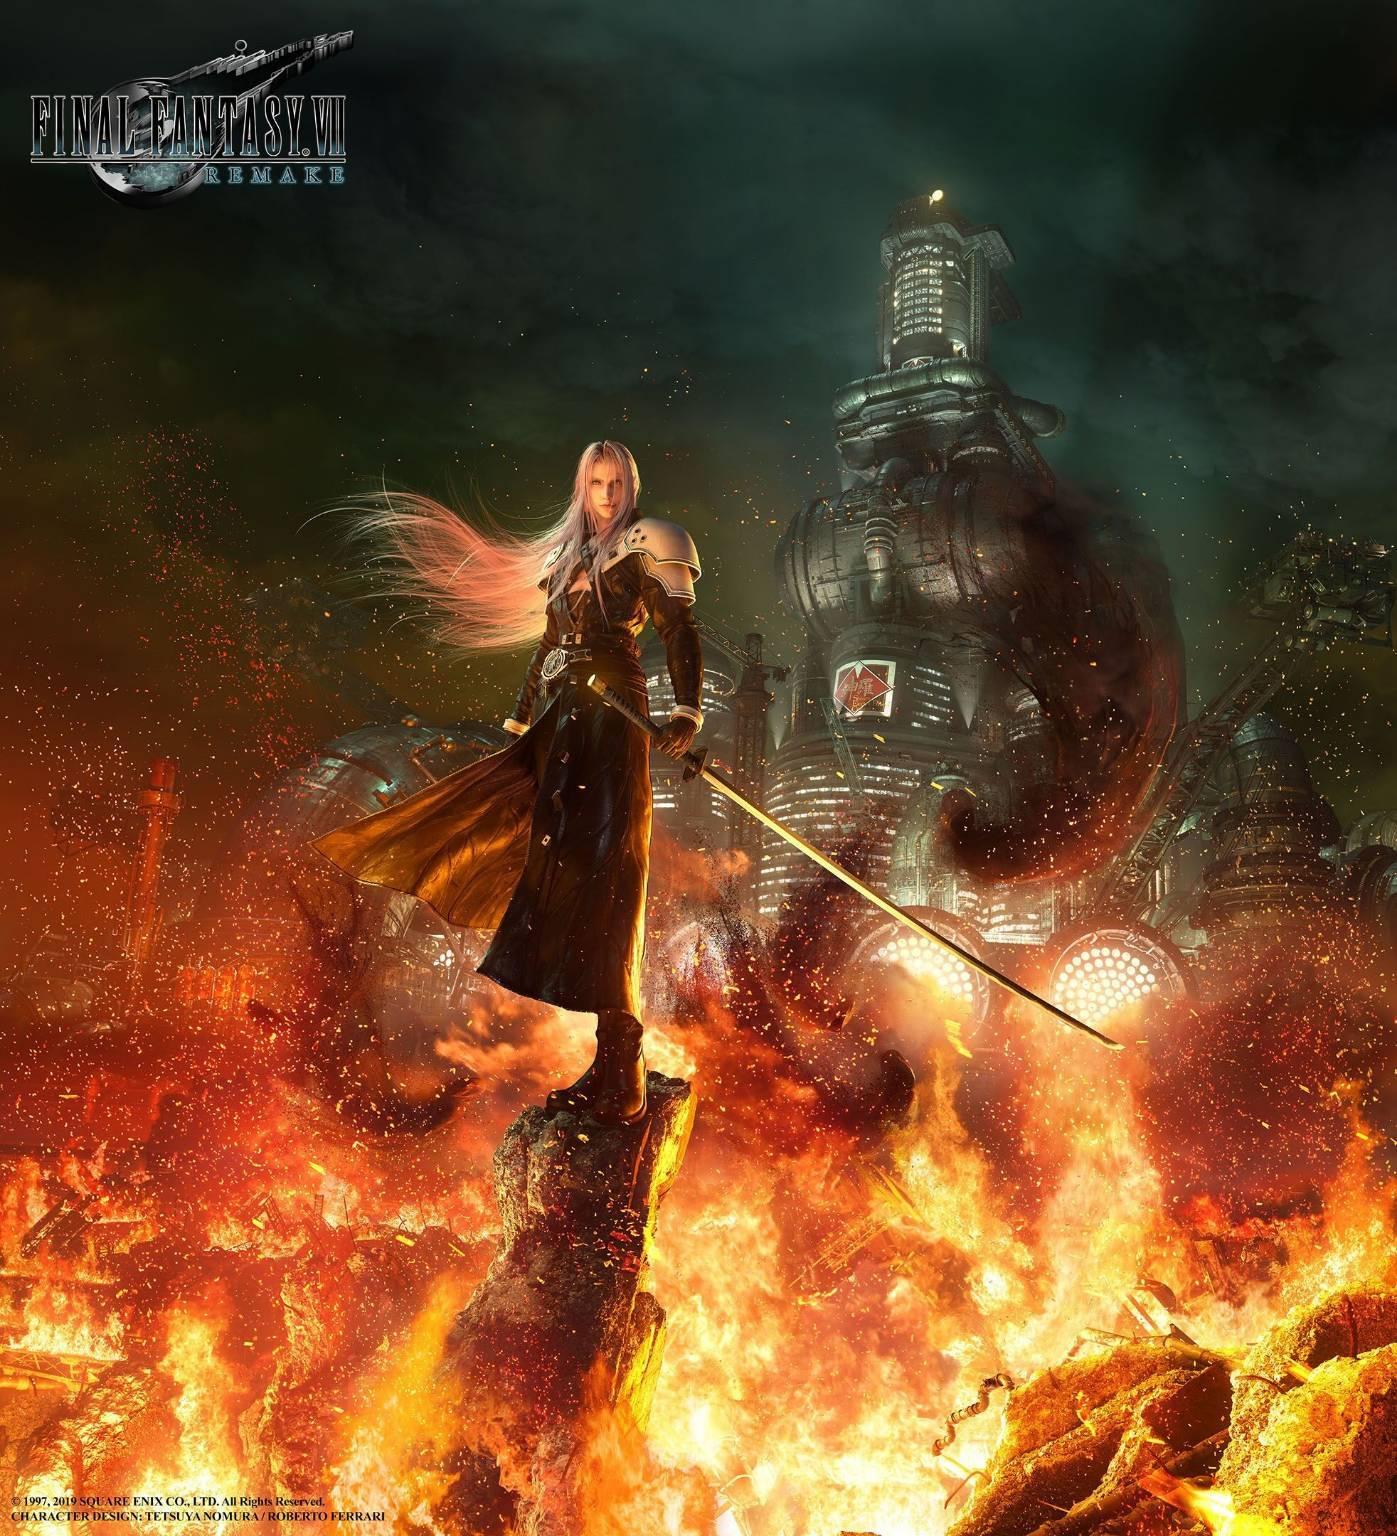 Final Fantasy 7 VII Remake